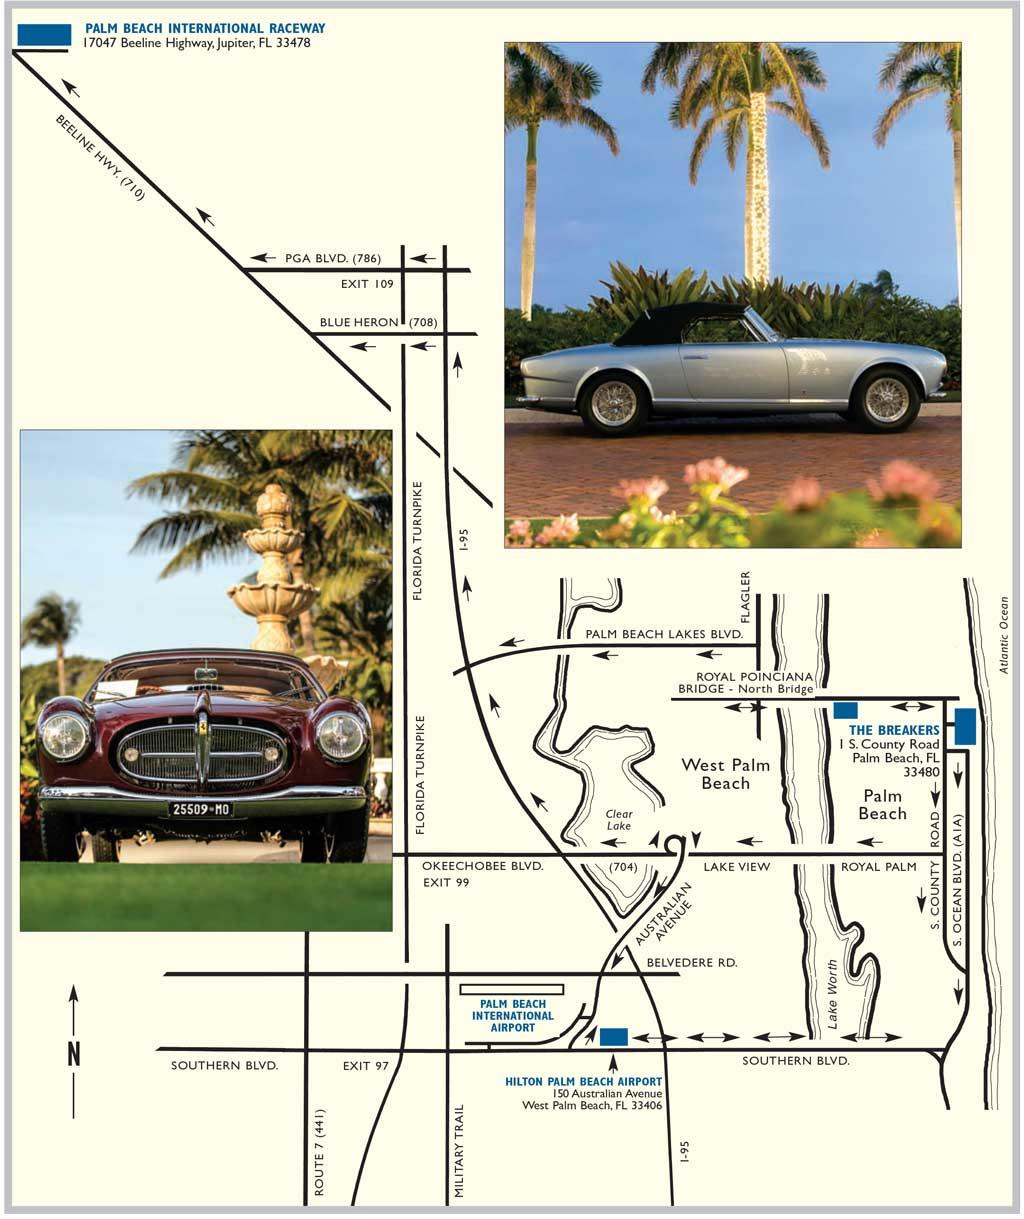 Map of Palm Beach Florida